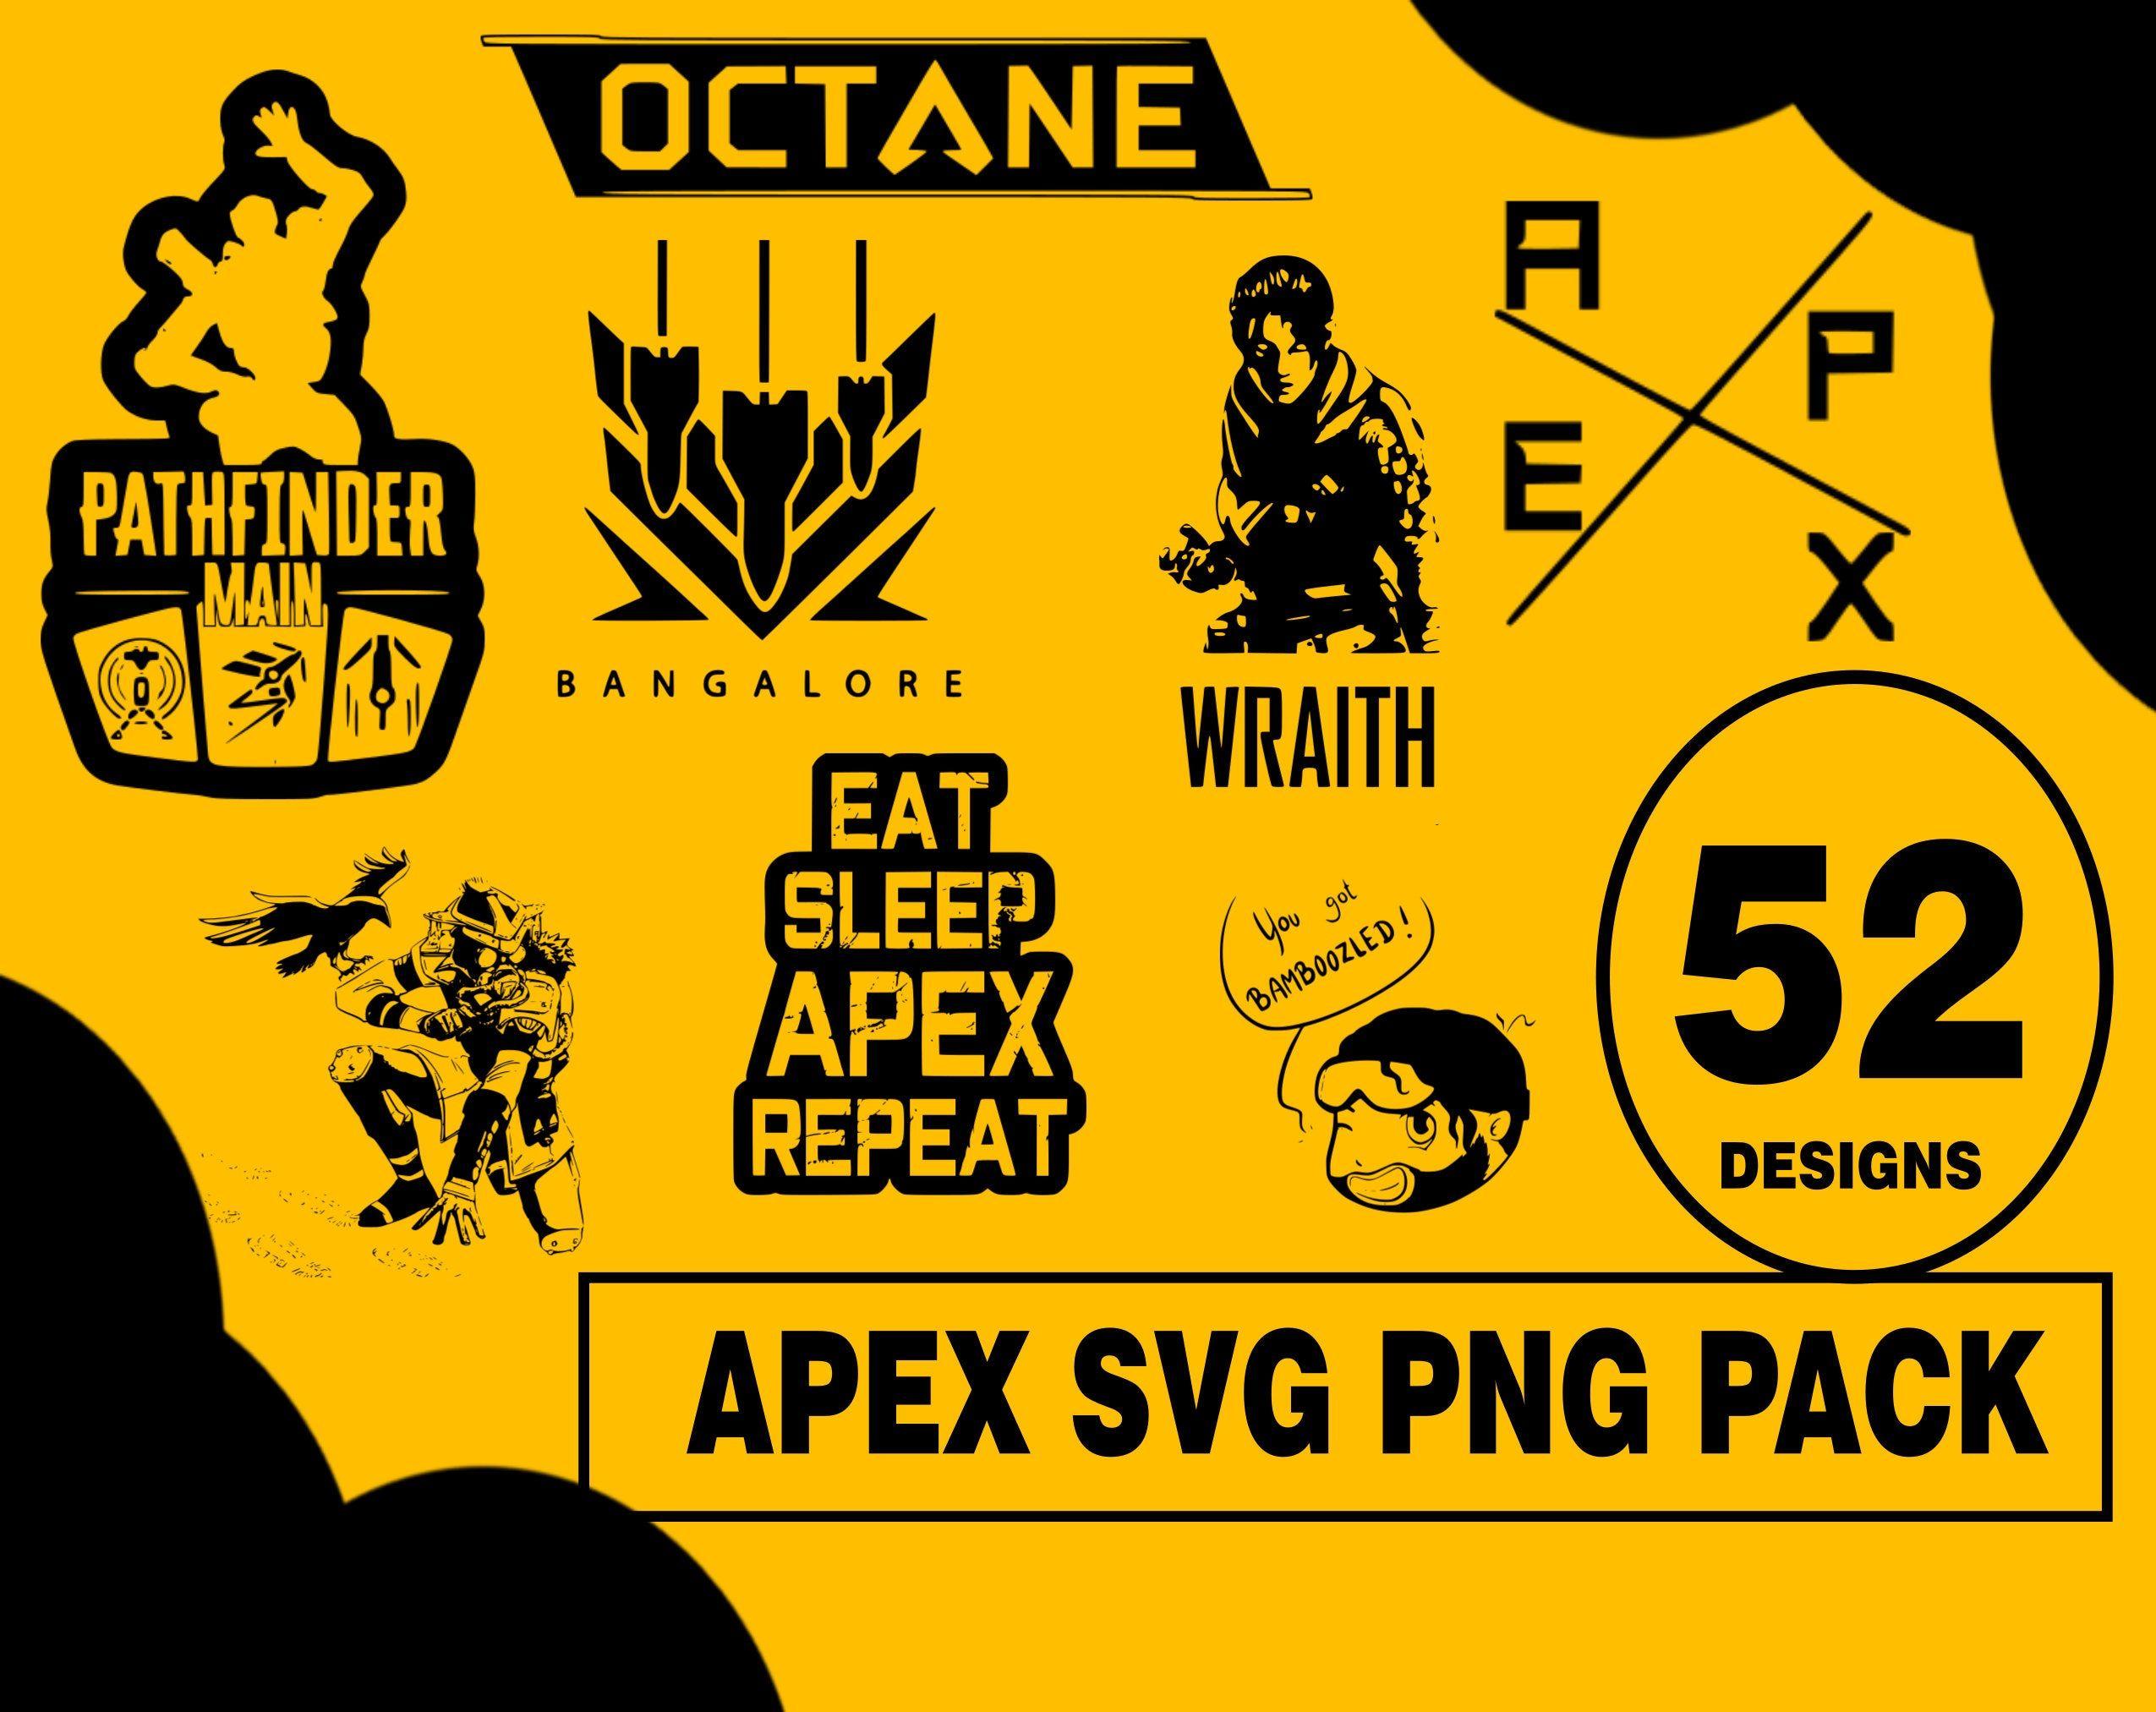 Apex Legends Svg Png Pack Apex Game Apex Design Pack Apex Legend Game Apex Video Game Apex Legends Video Game Svg Png Apex Vector Sv Apex Design Svg Apex